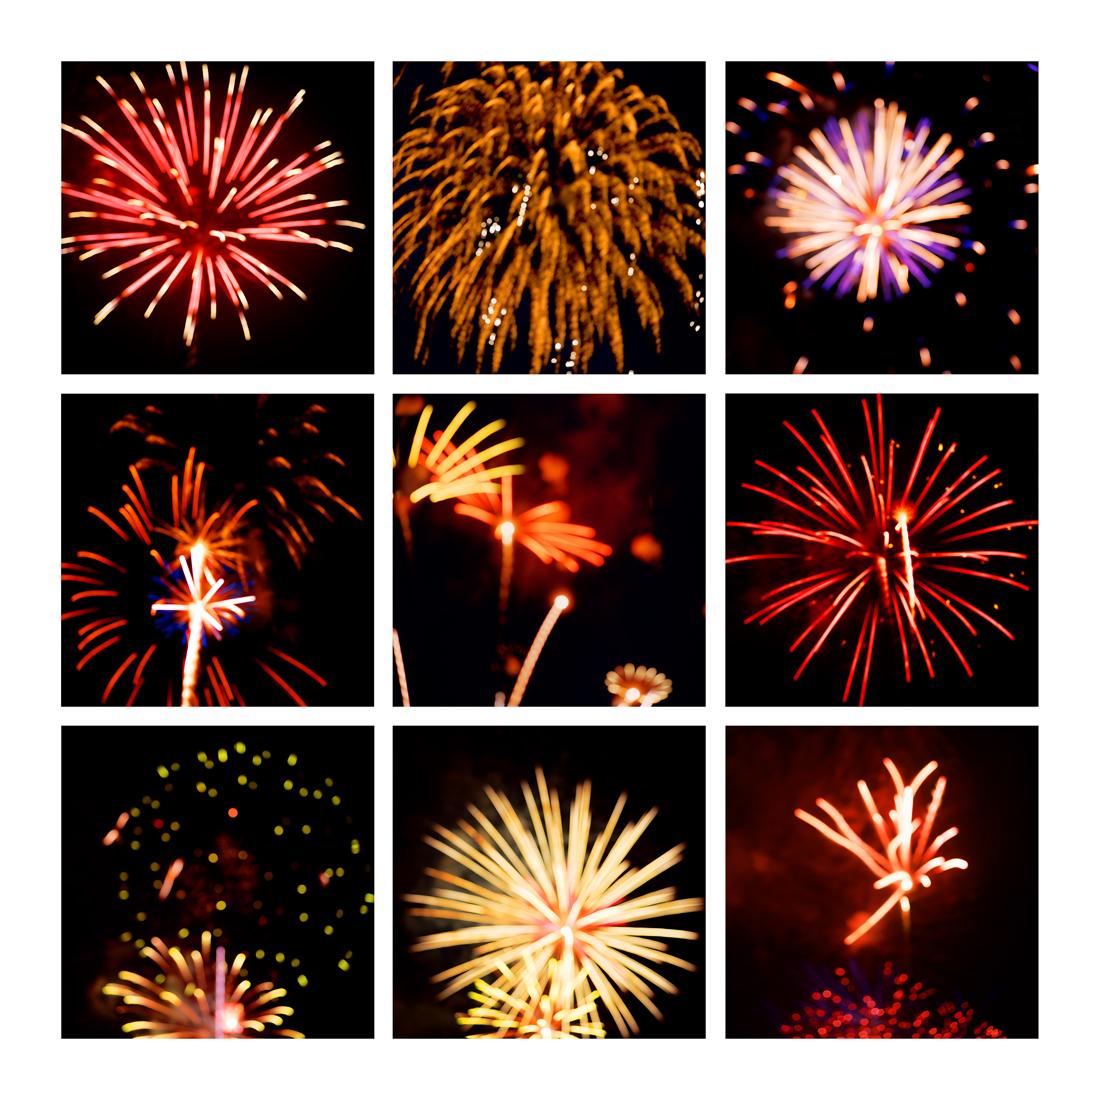 Fireworks #4, 2019 (2008-2019)